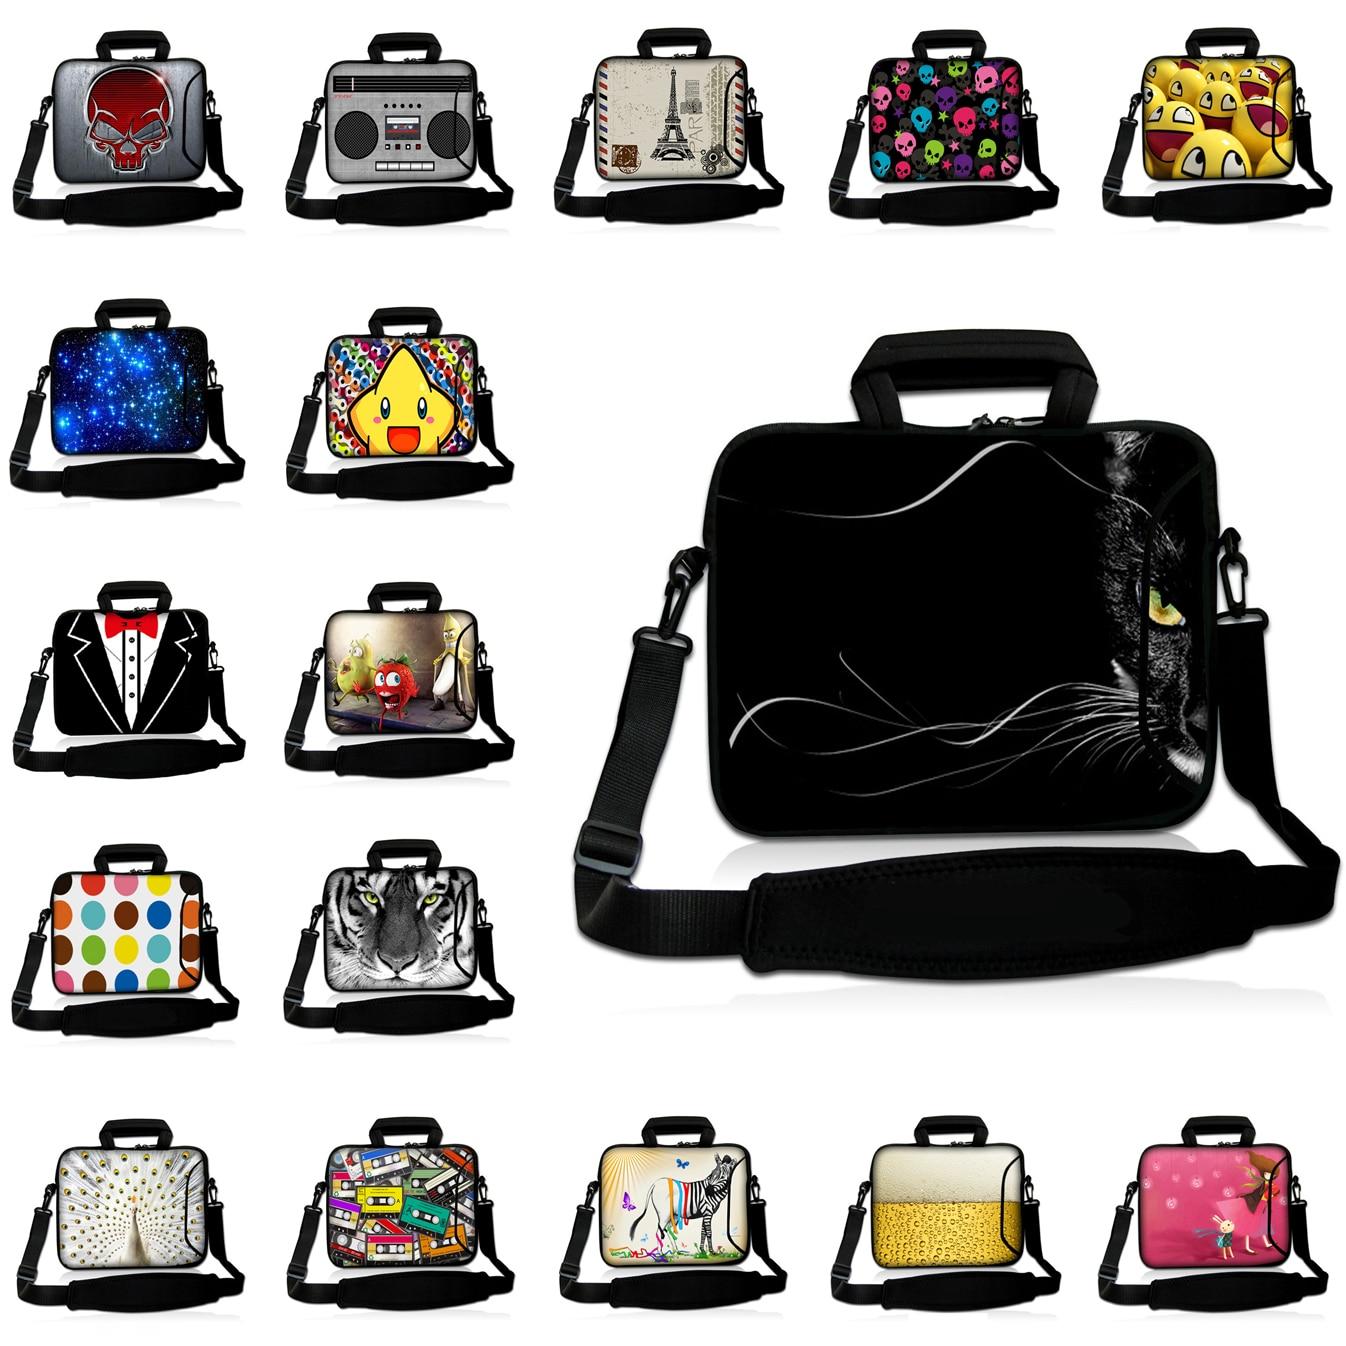 For Macbook Air HP Envy Case 15 13 10 12 15.6 17 9.7 14 inch Sleeve Laptop Bags Casual Shoulder Messenger Bag 13.3 Notebook Case